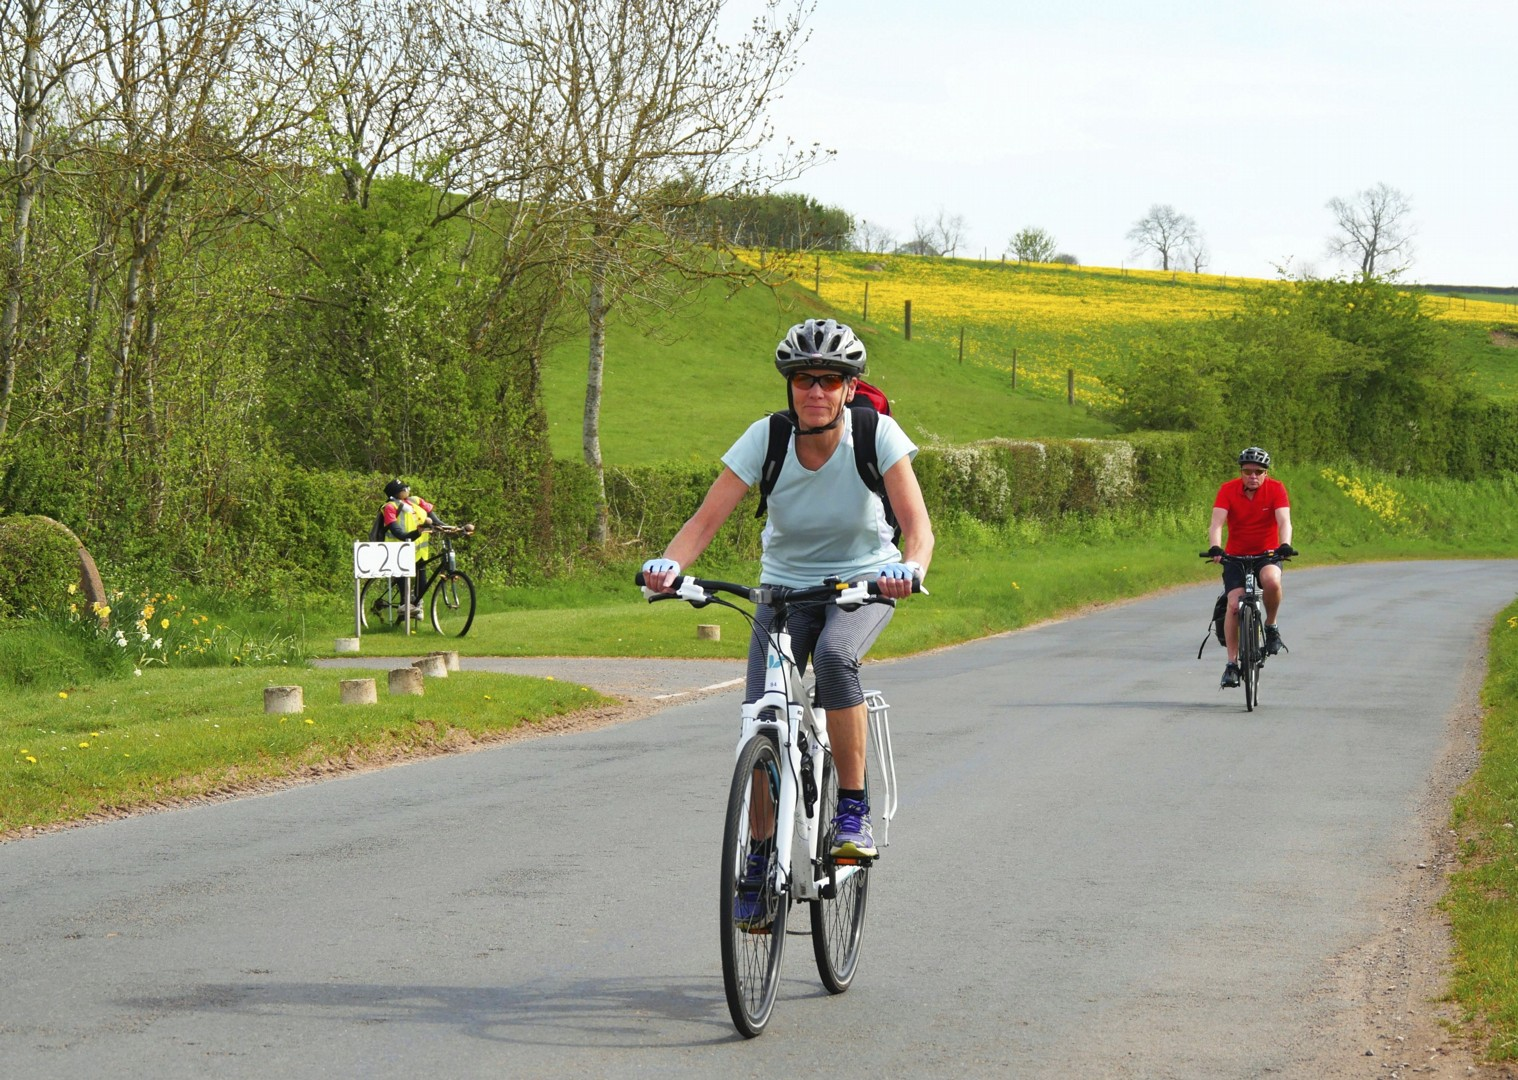 cycling-holiday-c2c-cycling.jpg - UK - C2C - Coast to Coast 5 Days Cycling - Self-Guided Leisure Cycling Holiday - Leisure Cycling